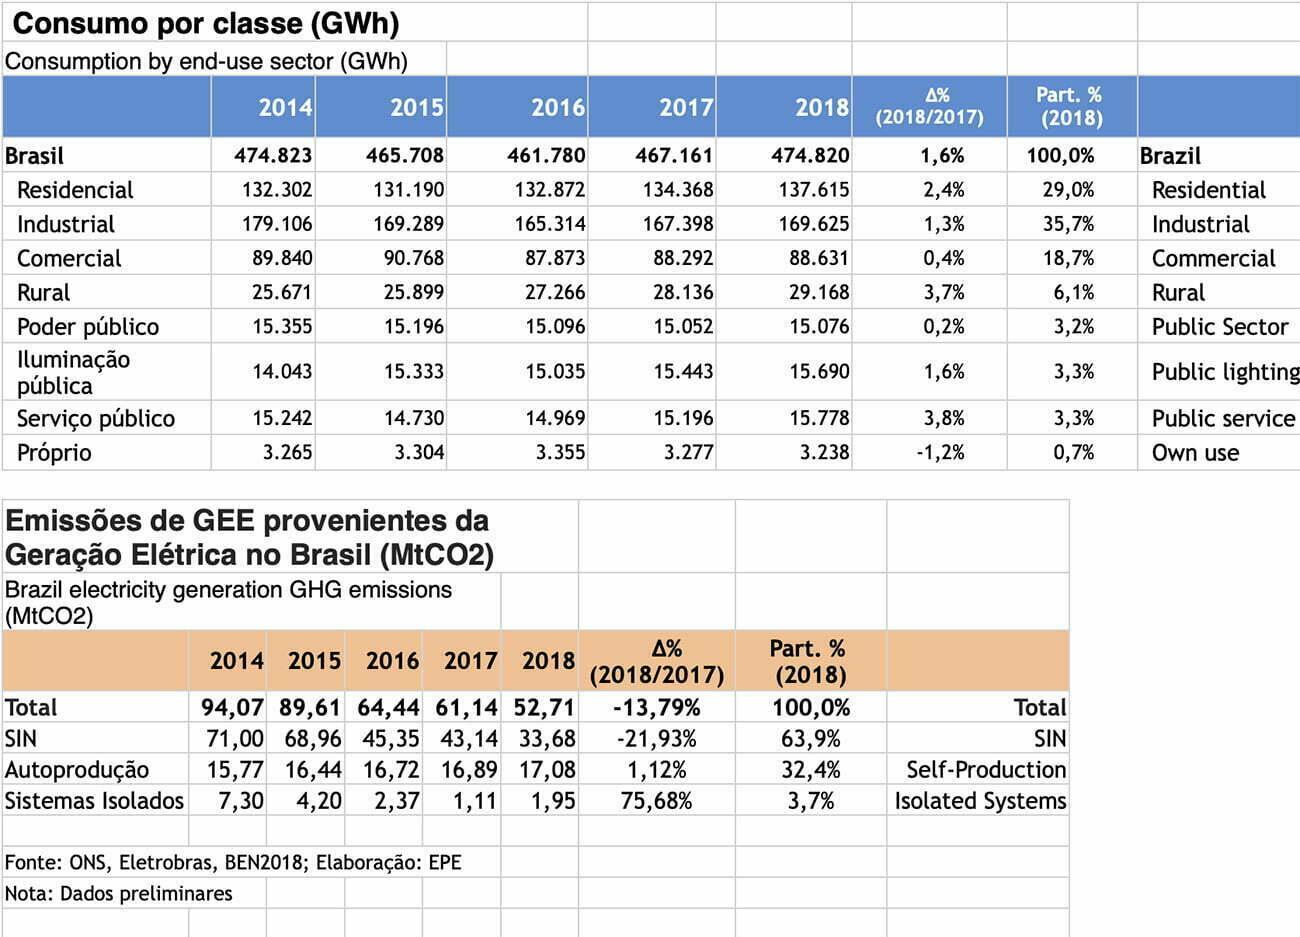 infográfico mostra consumo de energia por classes